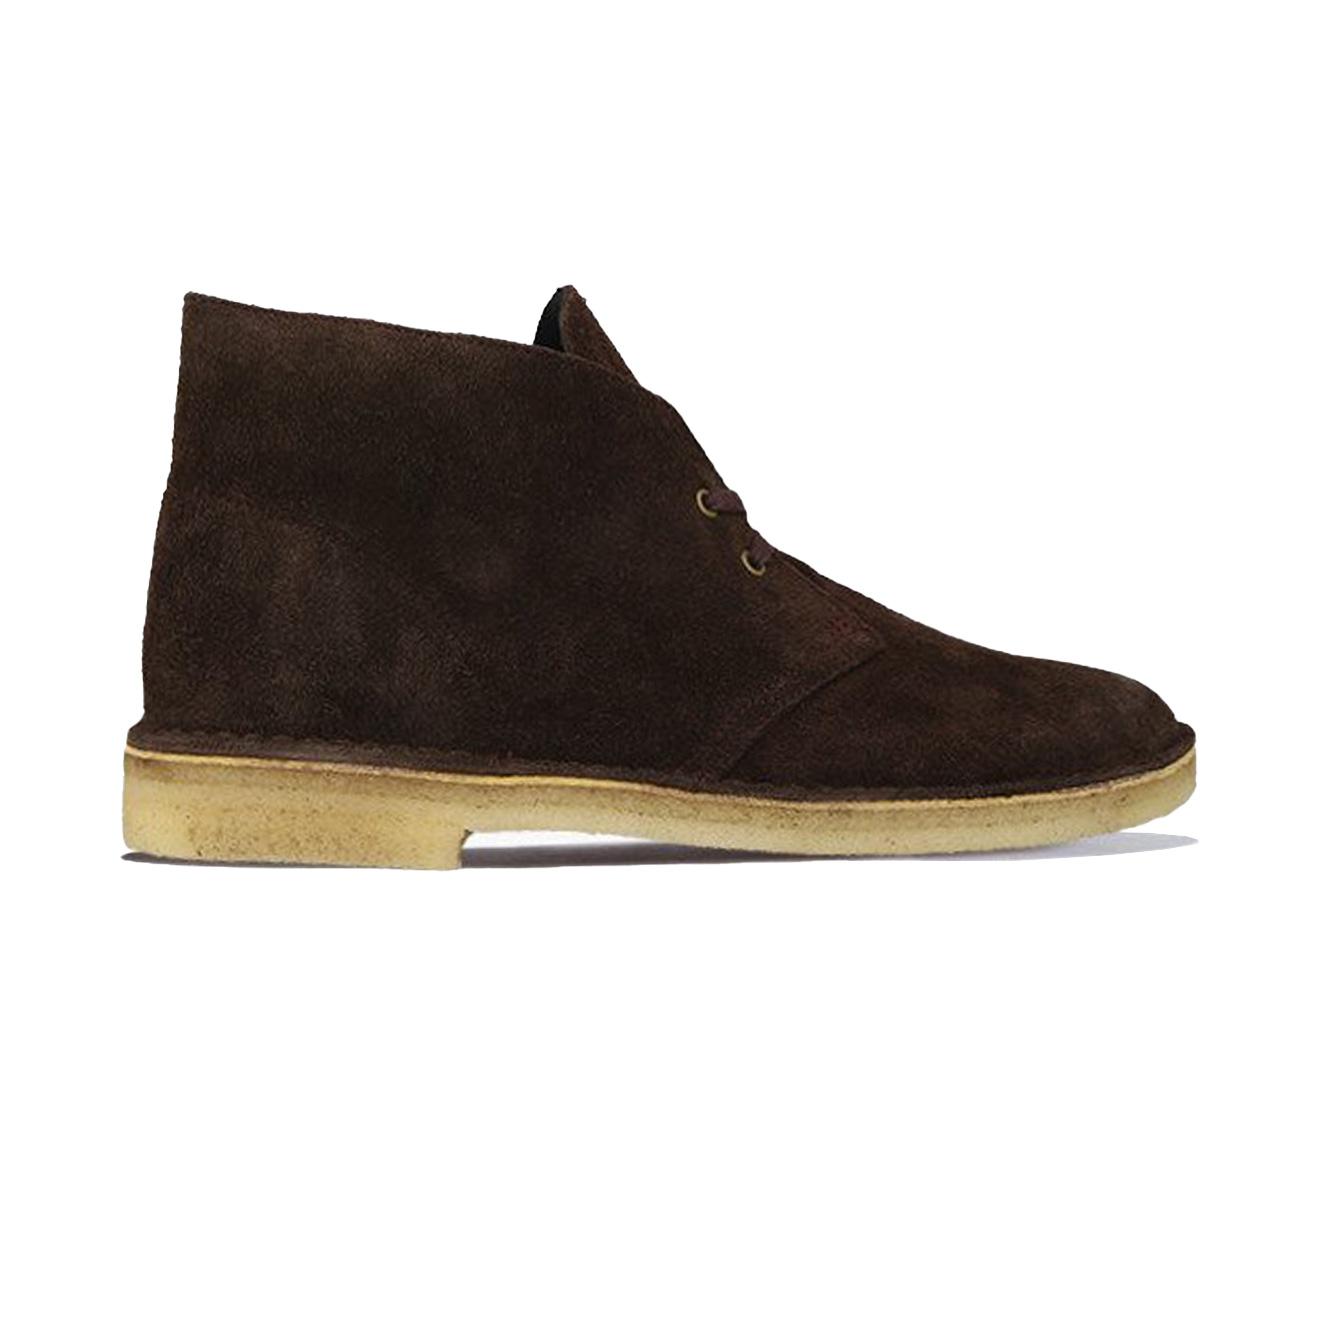 Clarks Originals masculino Desert Boot